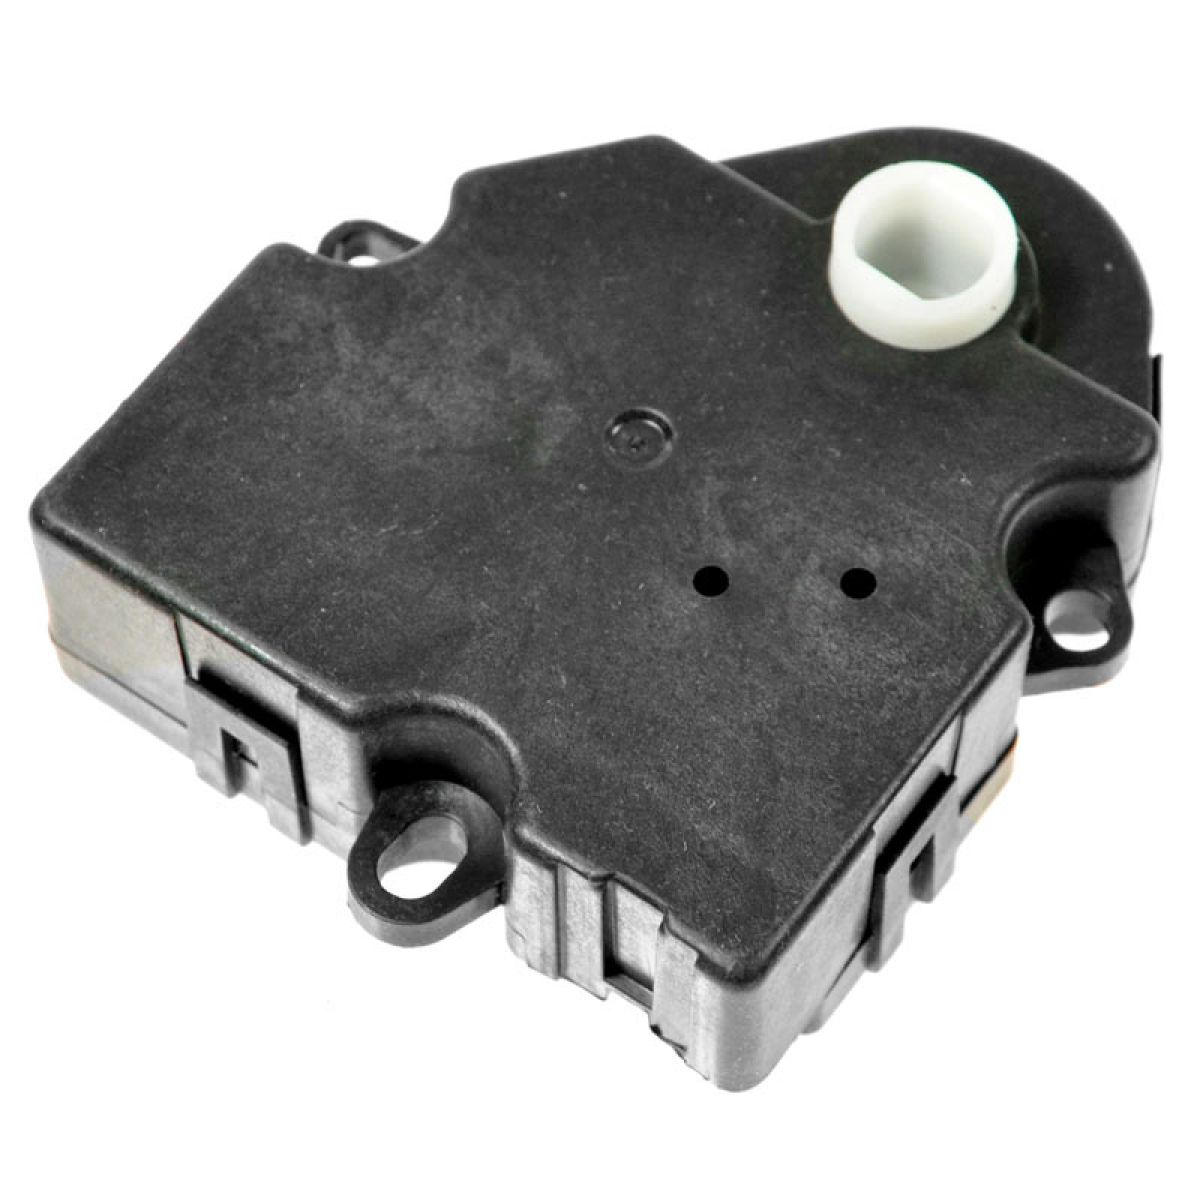 2009 Chevrolet Silverado 2500 Heating And Heating Parts Diagram Free